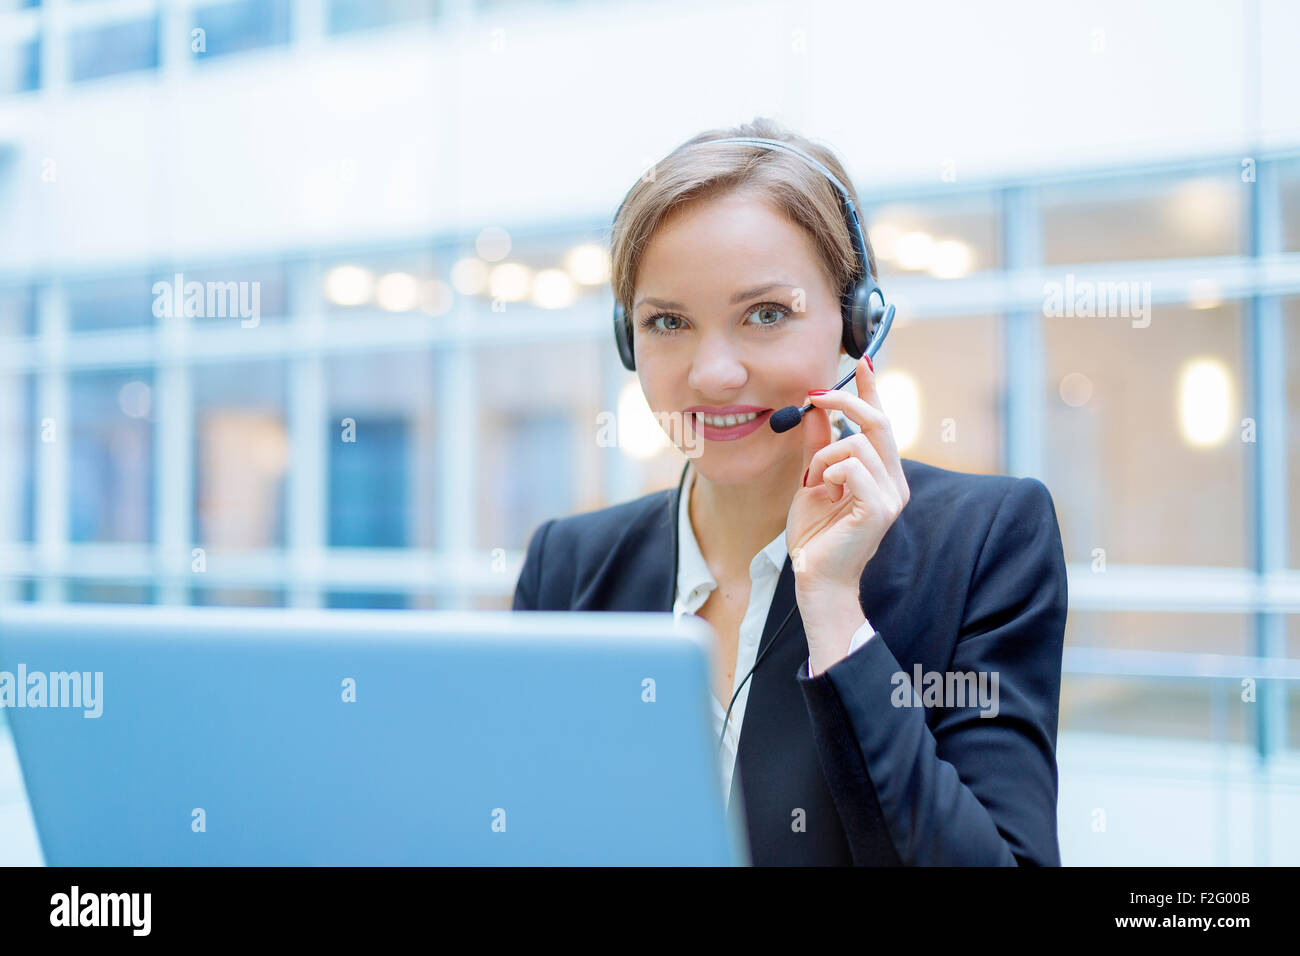 Operator talking on microphone - Stock Image